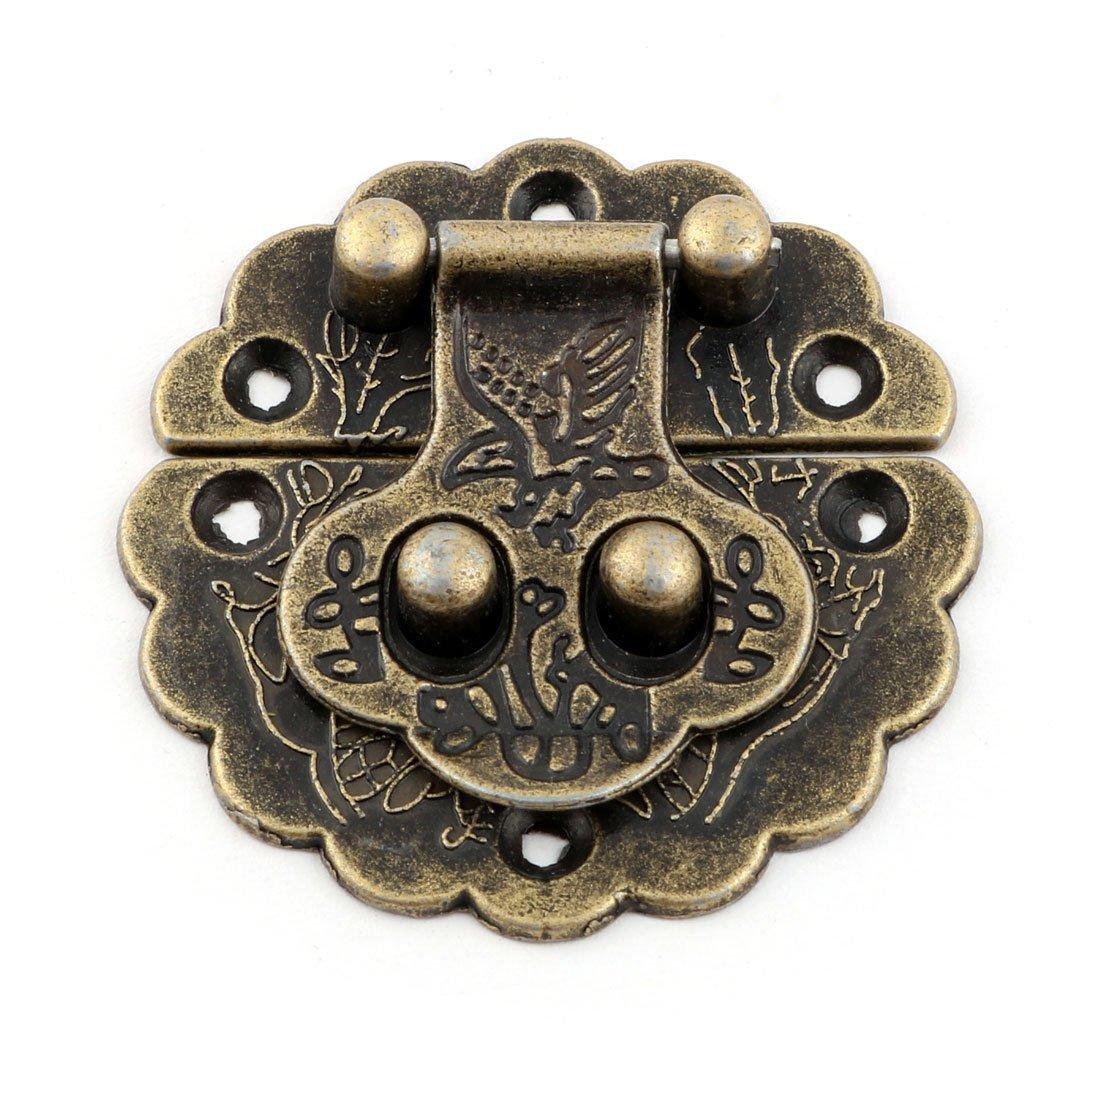 Amazon.com: eDealMax Estilo Vintage Maleta del Metal decorativo del cerrojo del pestillo de bloqueo DE 4 x 4 cm 4pcs tono de Bronce: Home & Kitchen